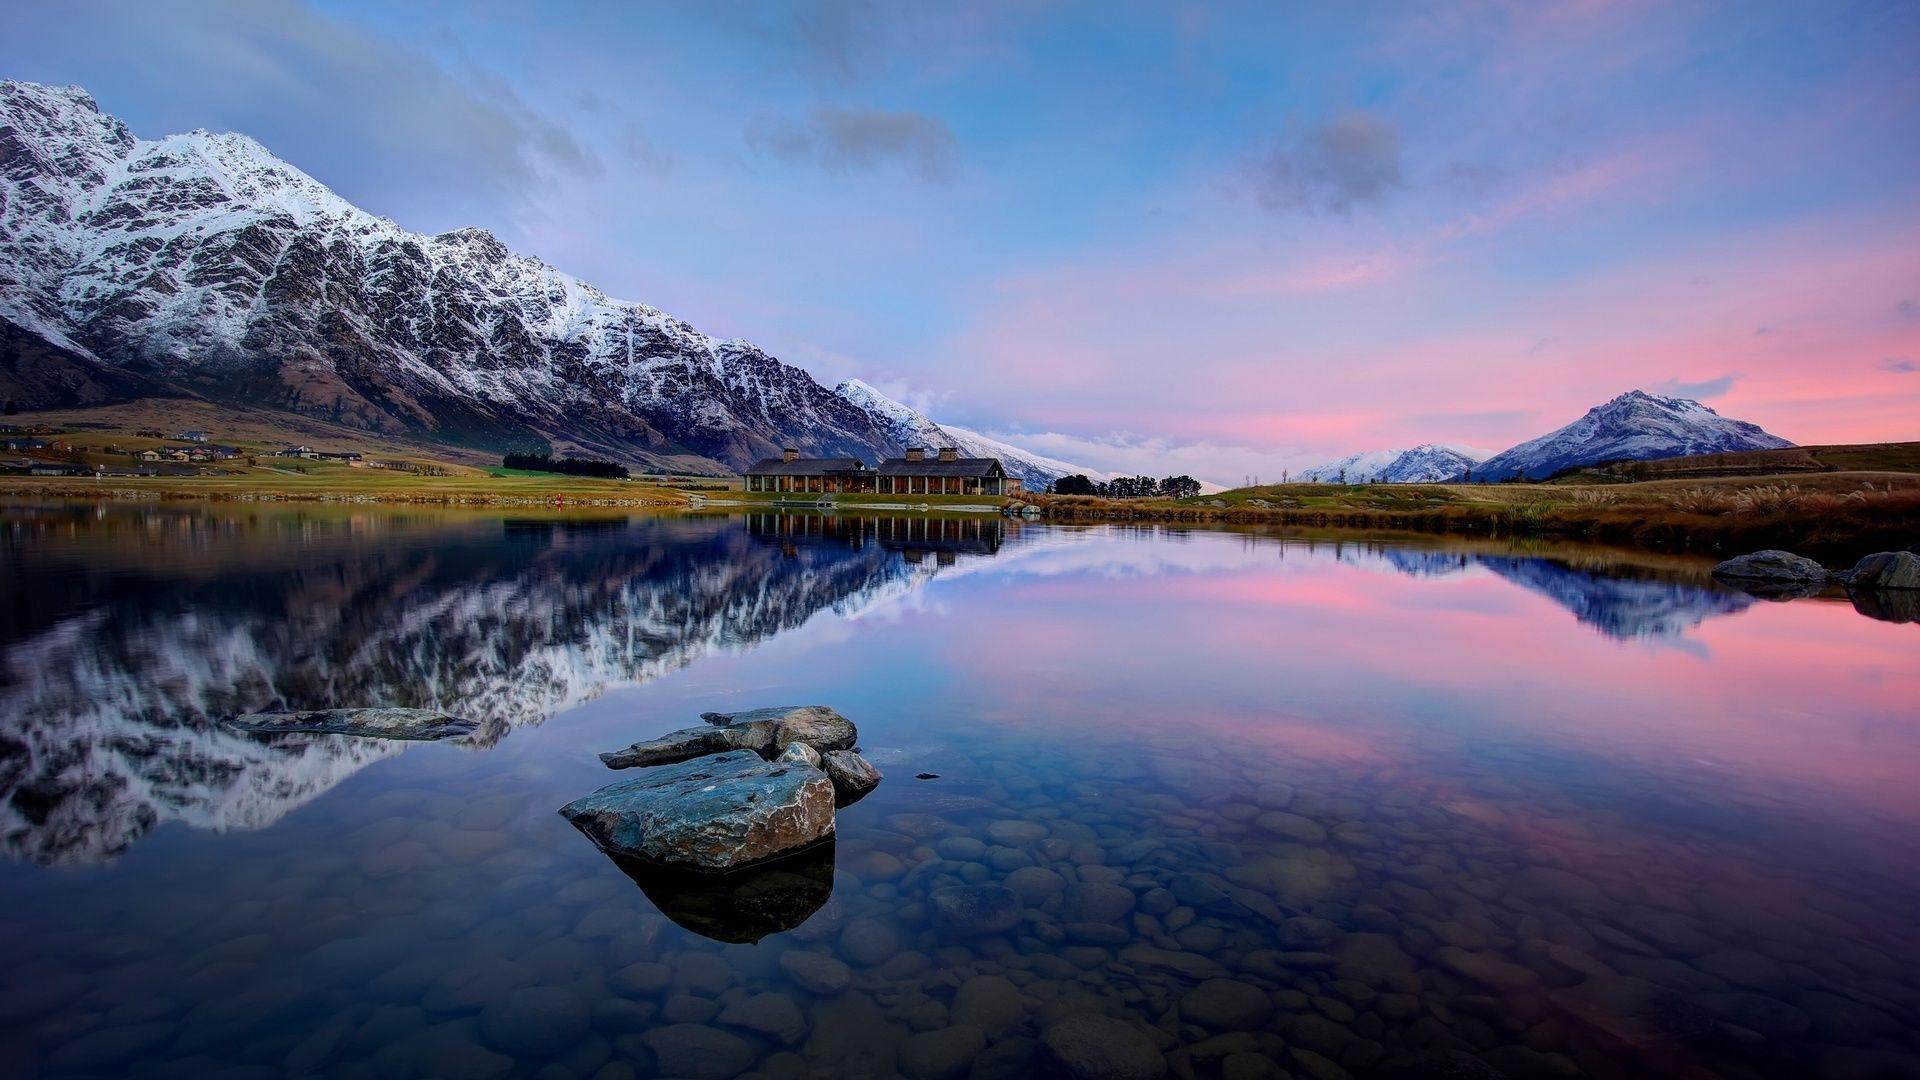 New Zealand hd image